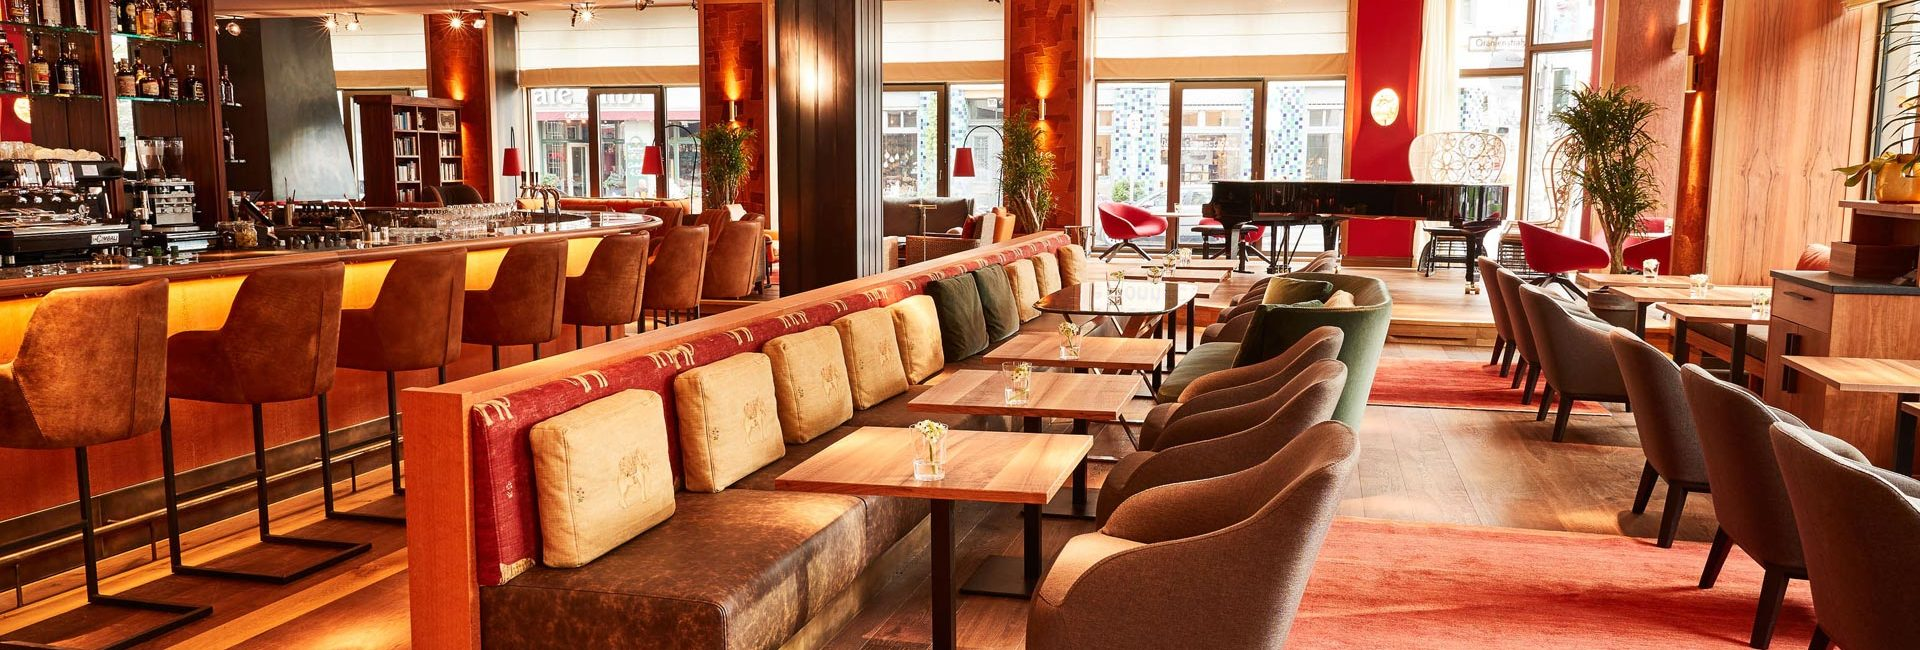 Maler Reichenbach Referenz Orania Bar